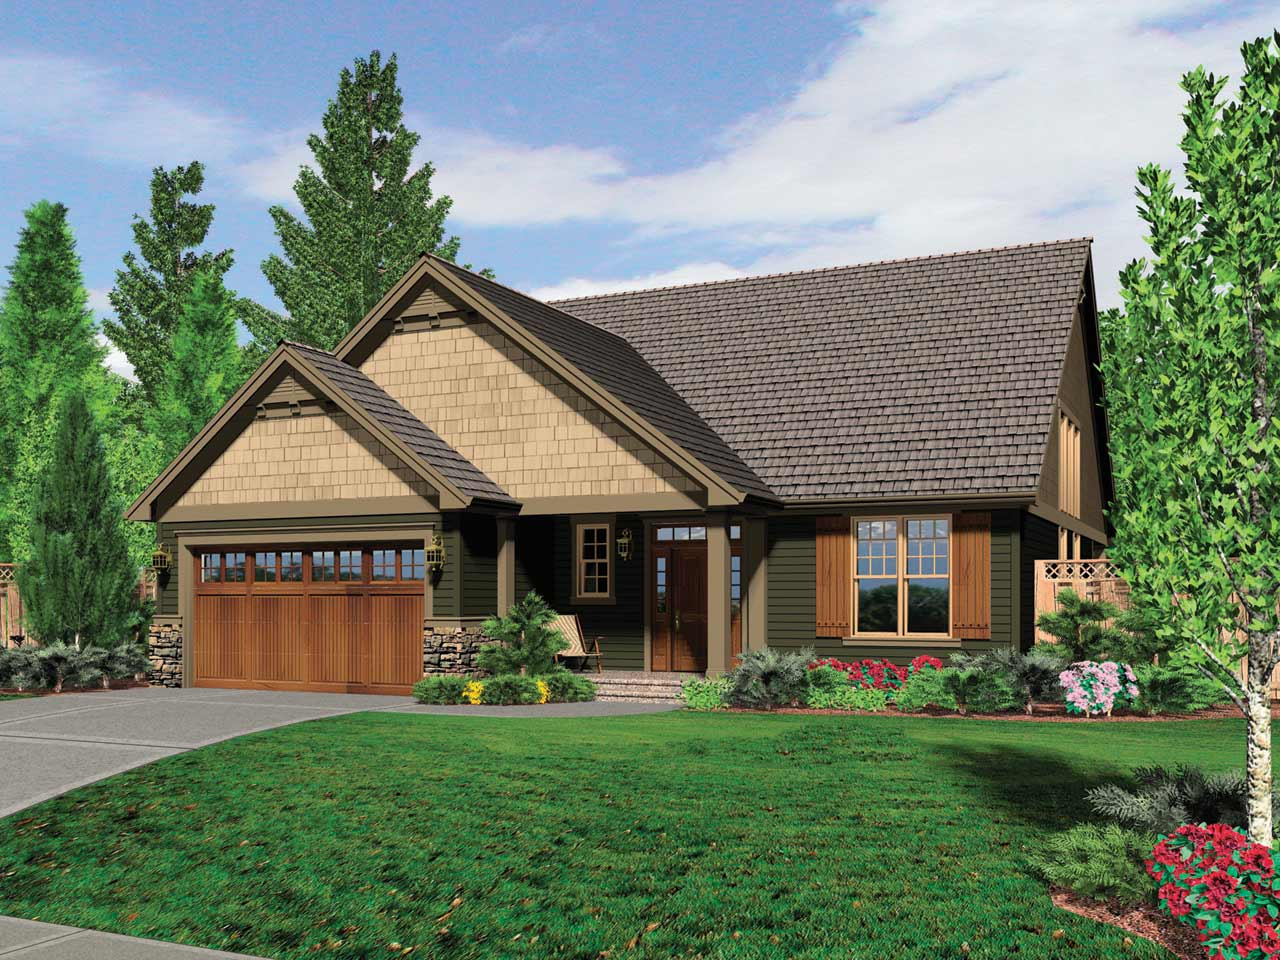 Craftsman Style Home Design Plan: 74-533